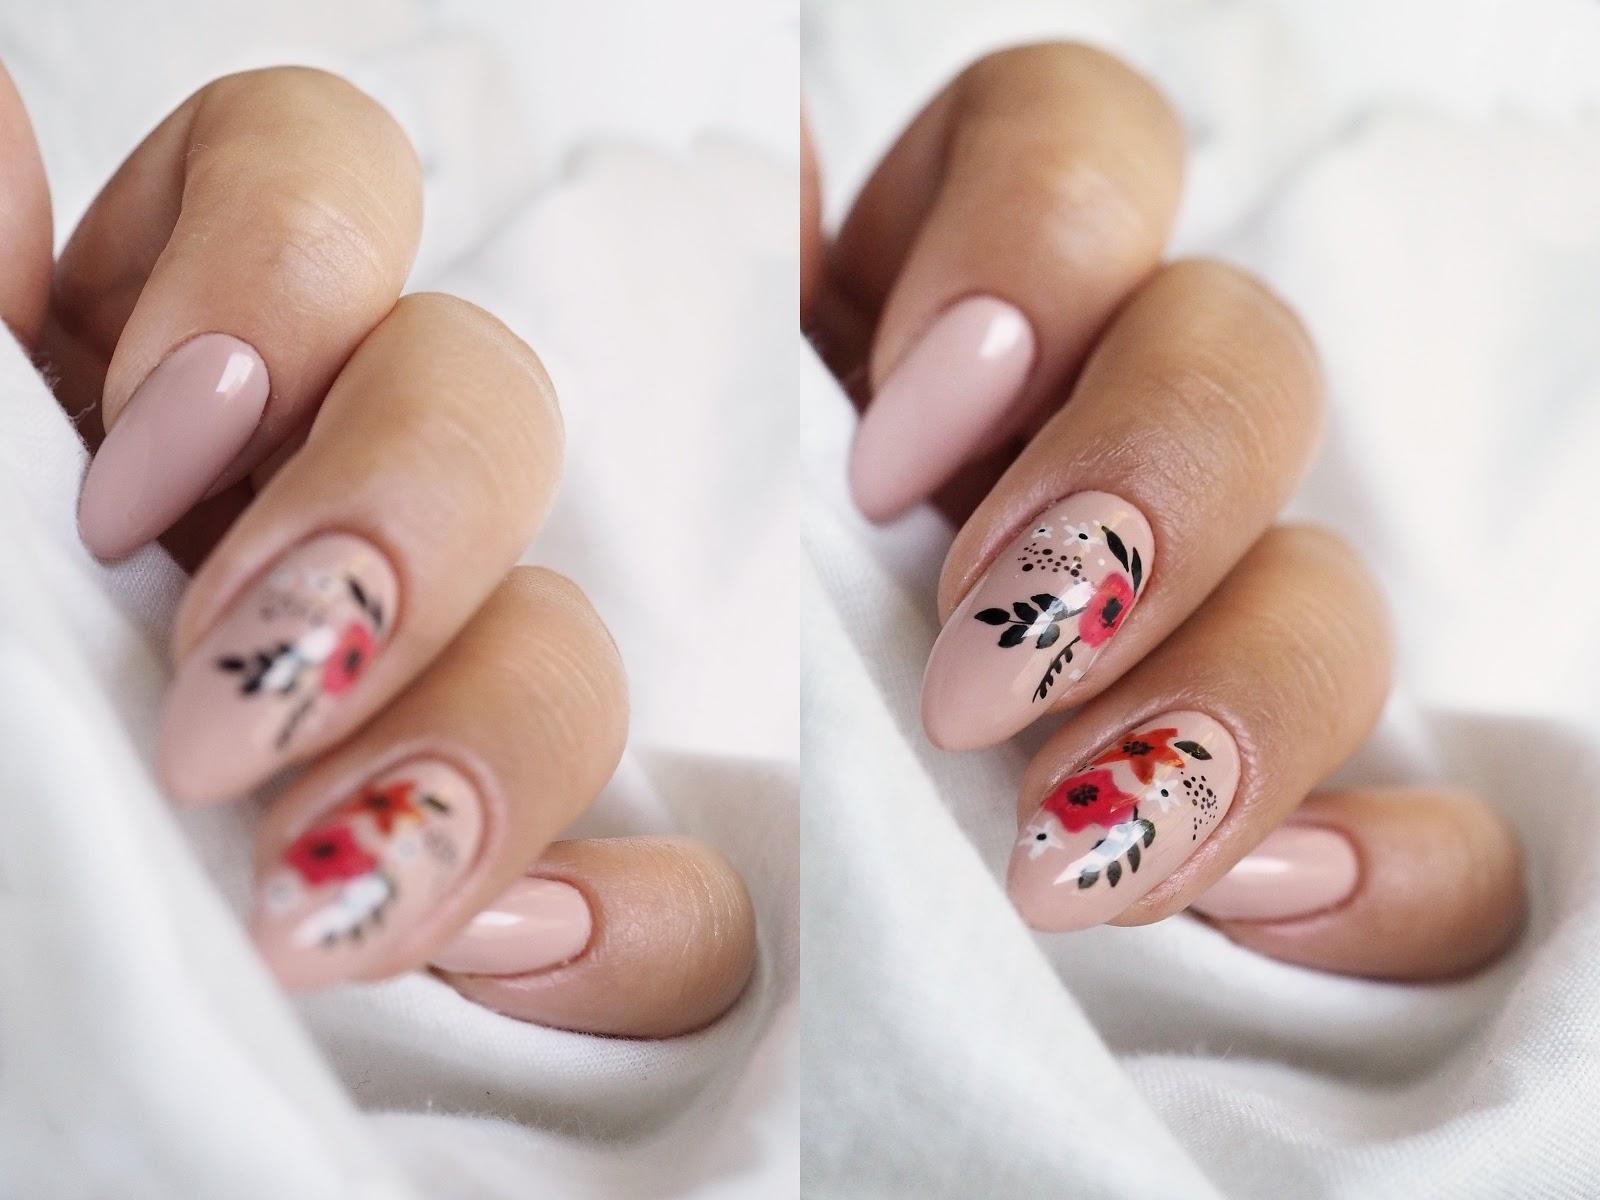 proste wzory na paznokcie